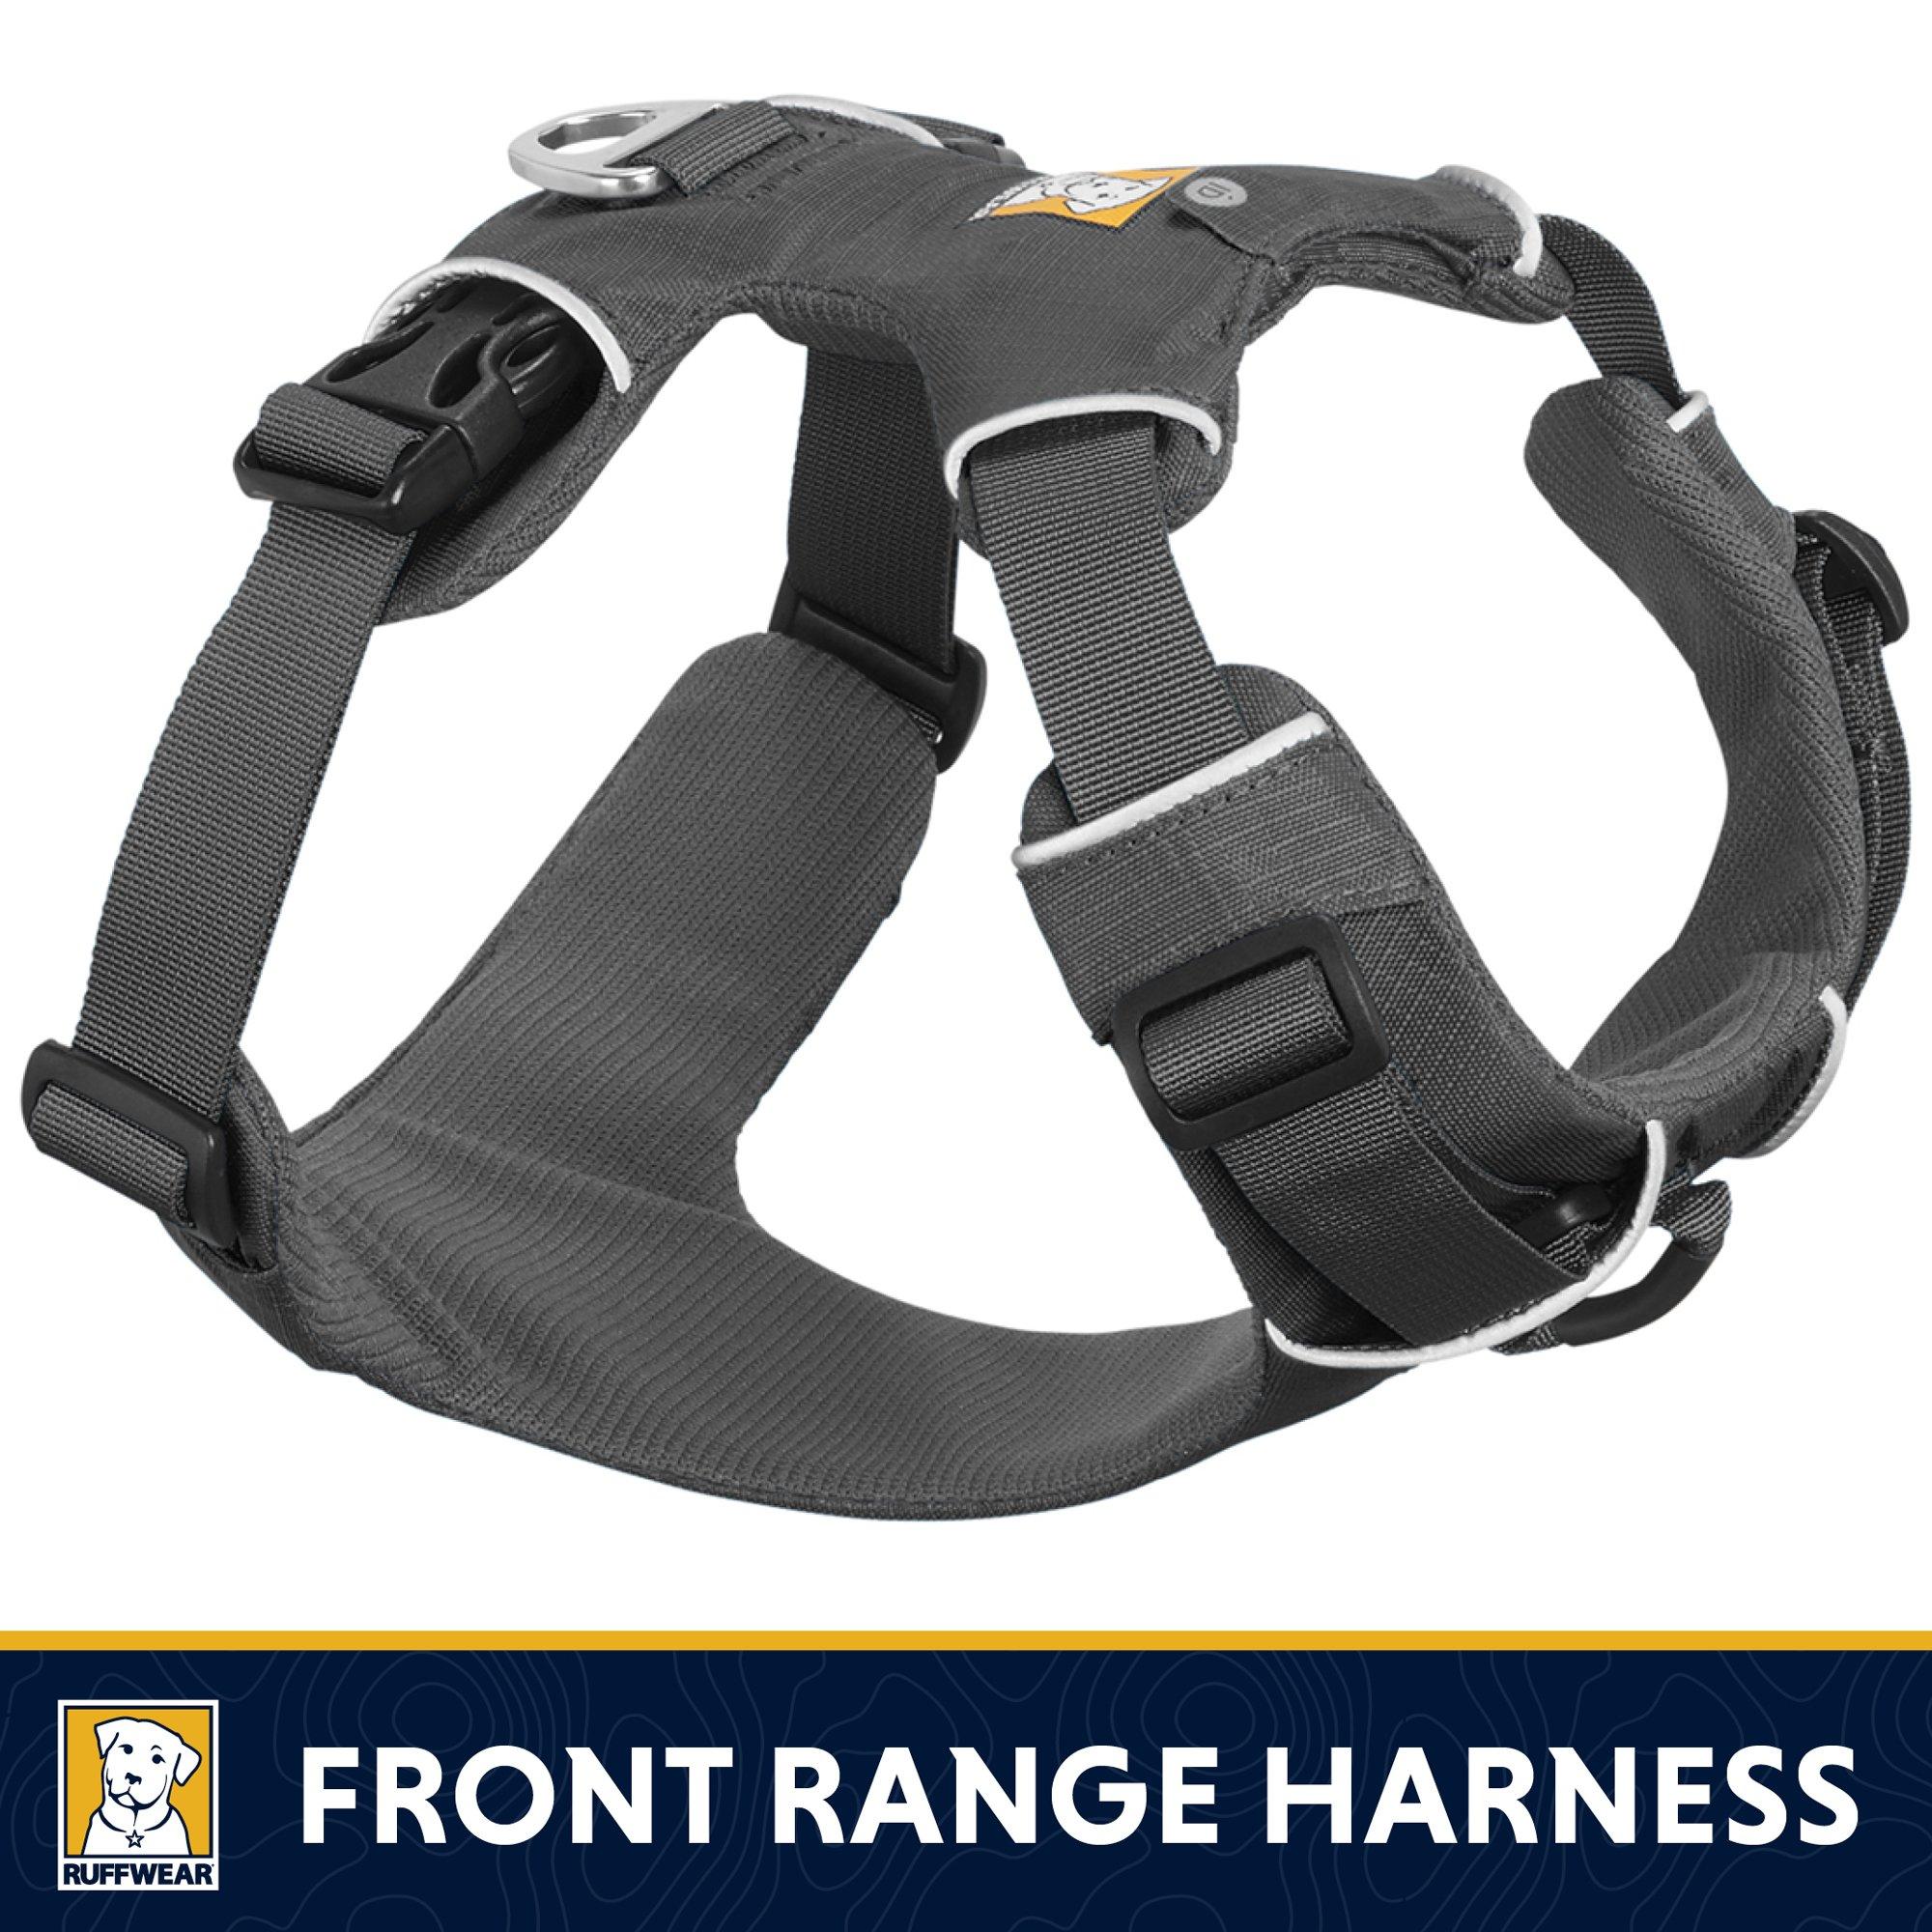 RUFFWEAR - Front Range No-Pull Dog Harness with Front Clip, Twilight Gray, Medium